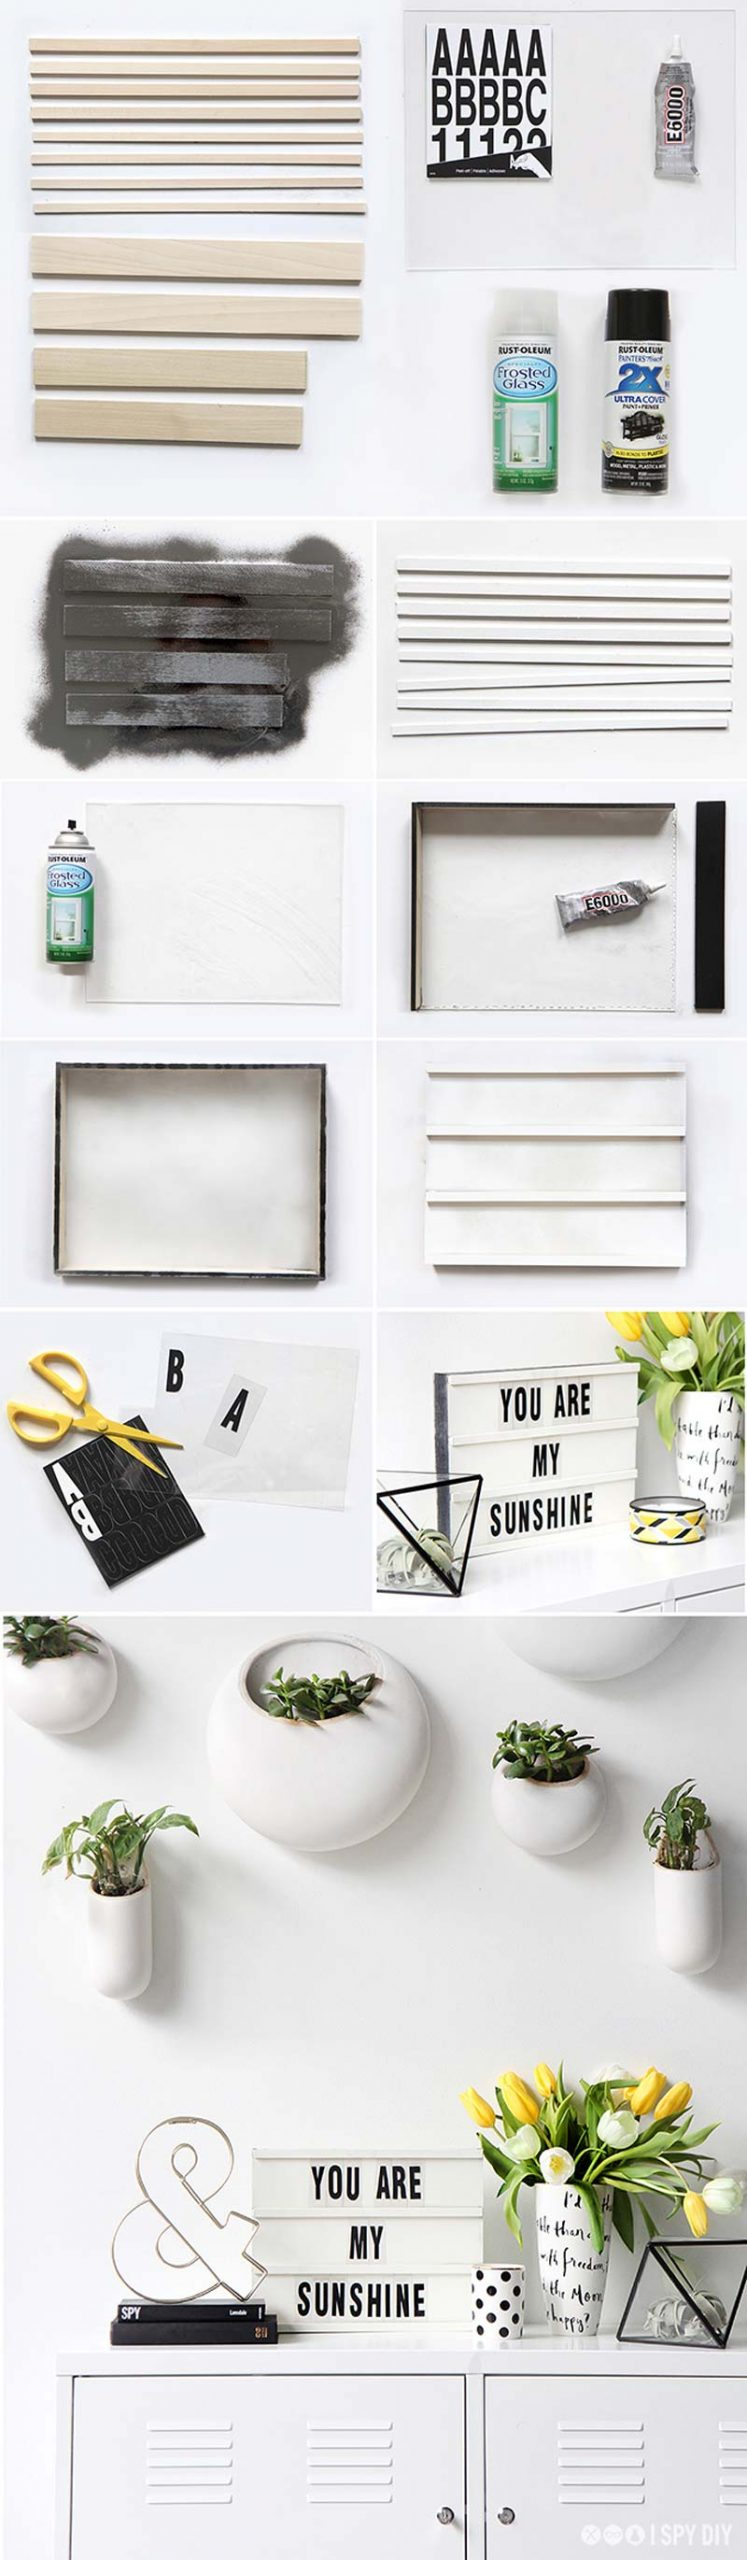 DIY lightbox maken